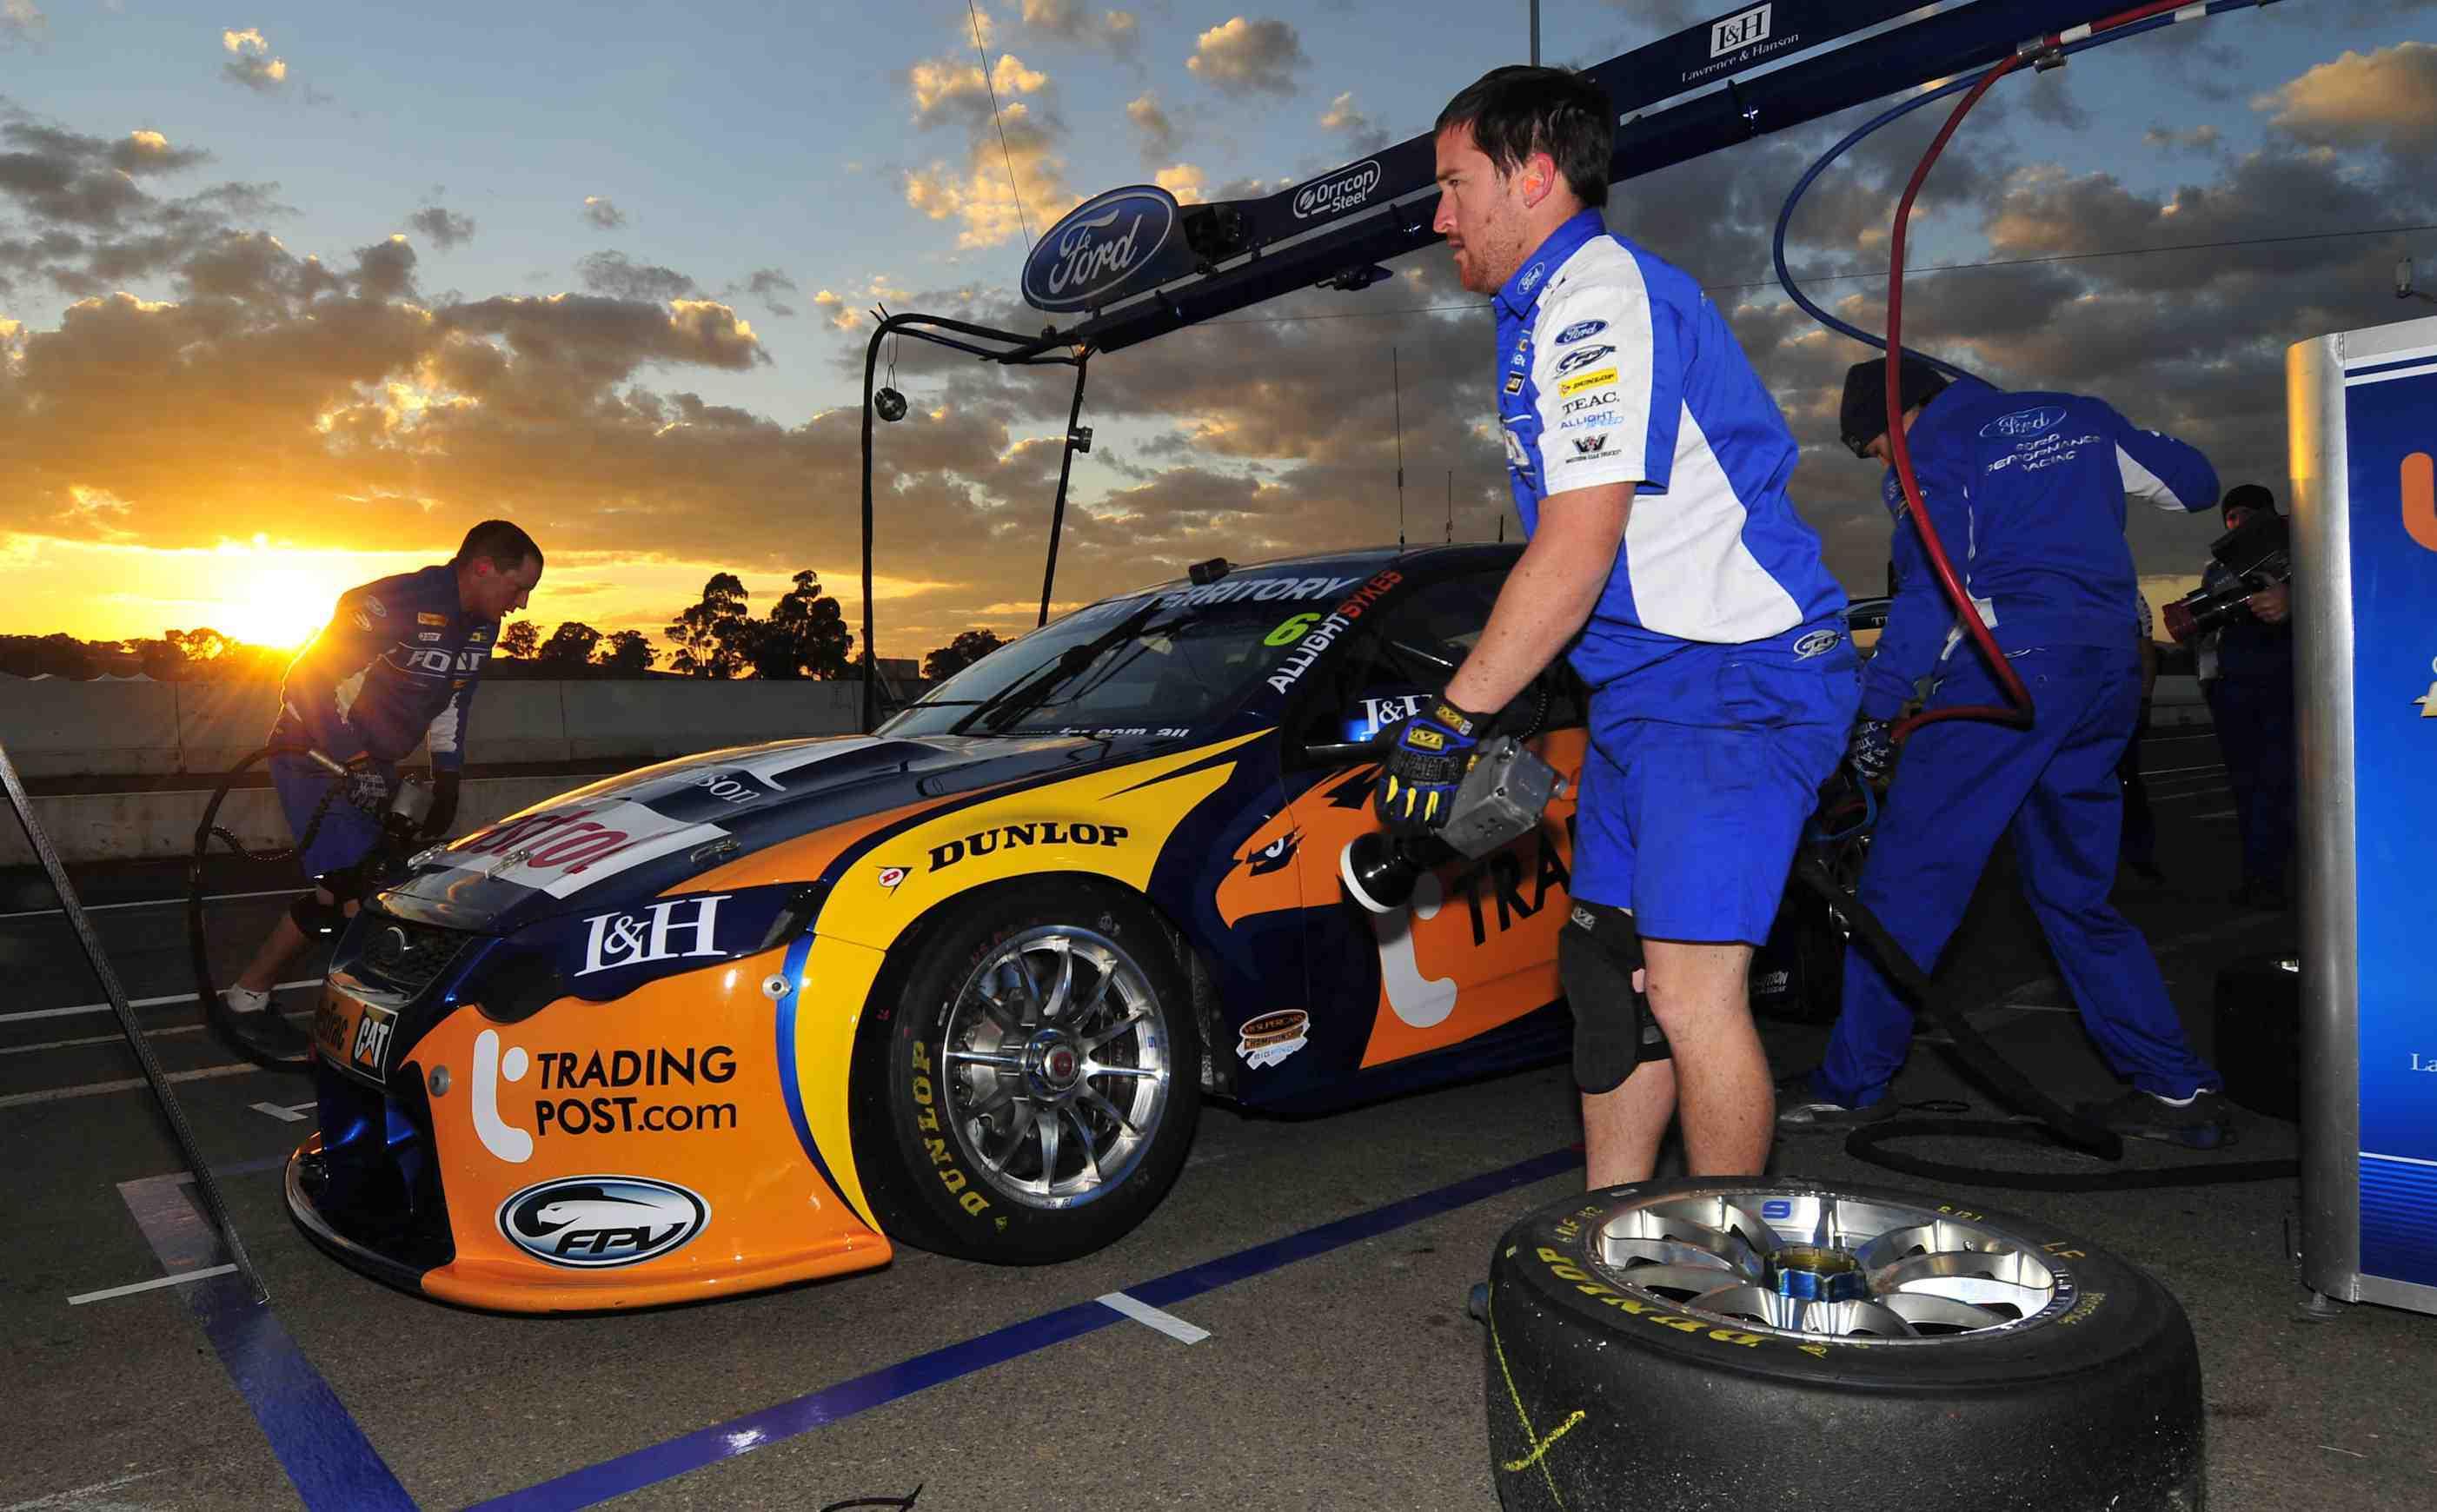 FPR banks more soft tyre testing